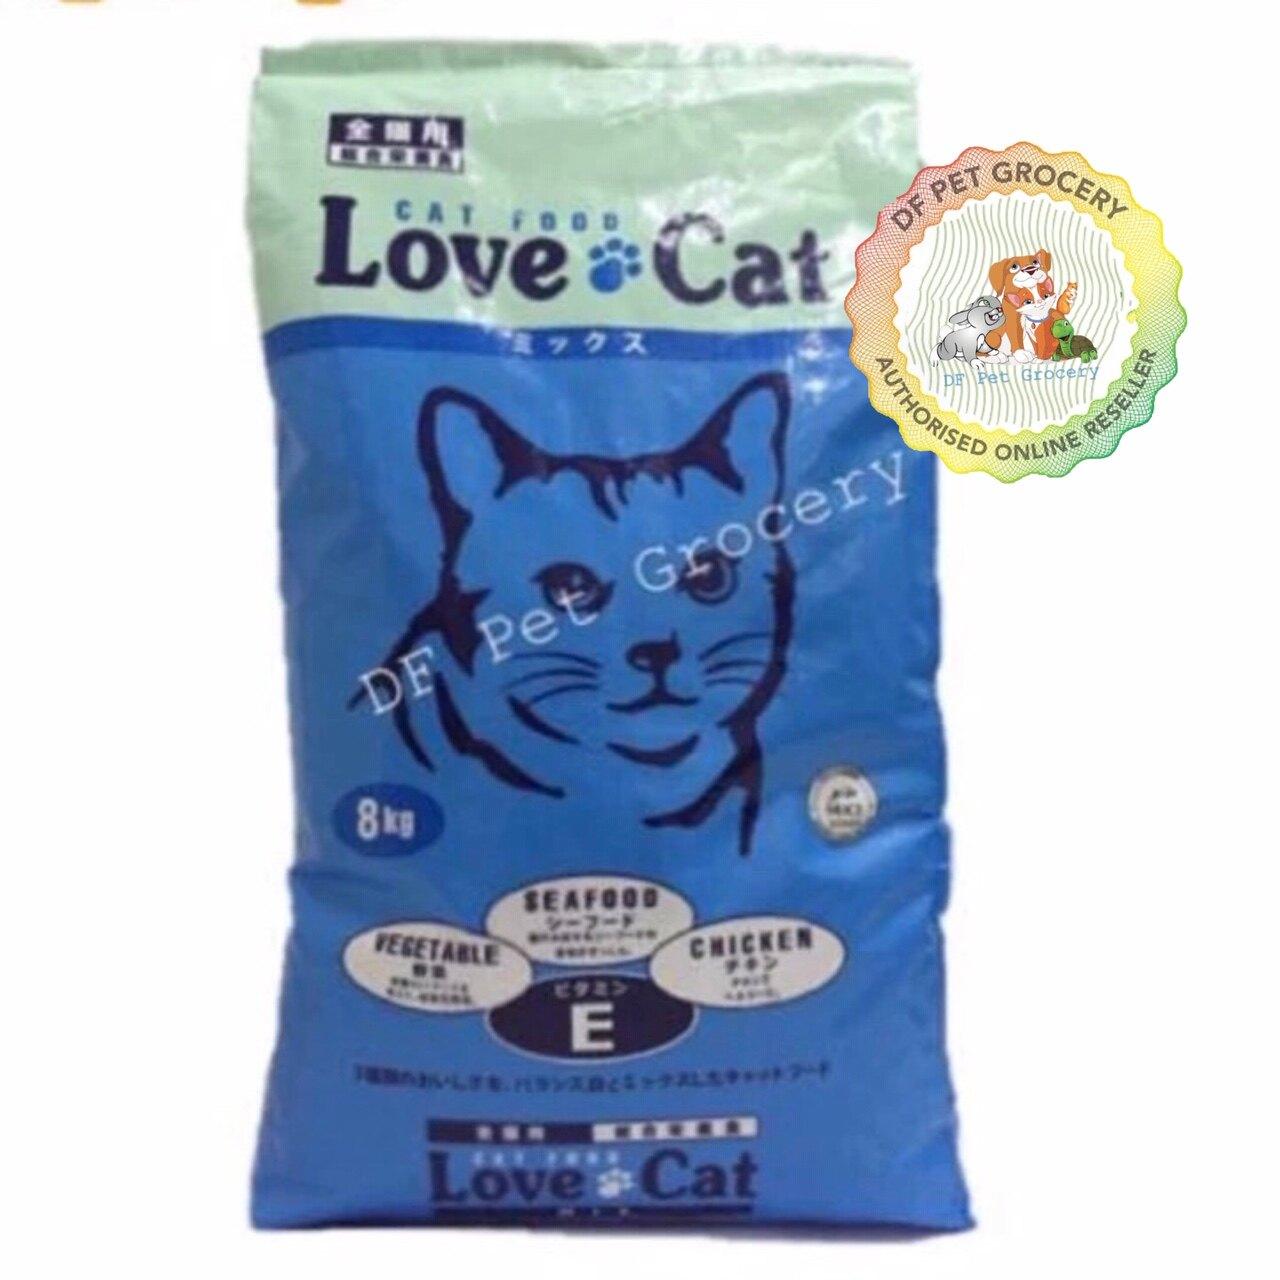 Love Cat - Cat Food 8kg